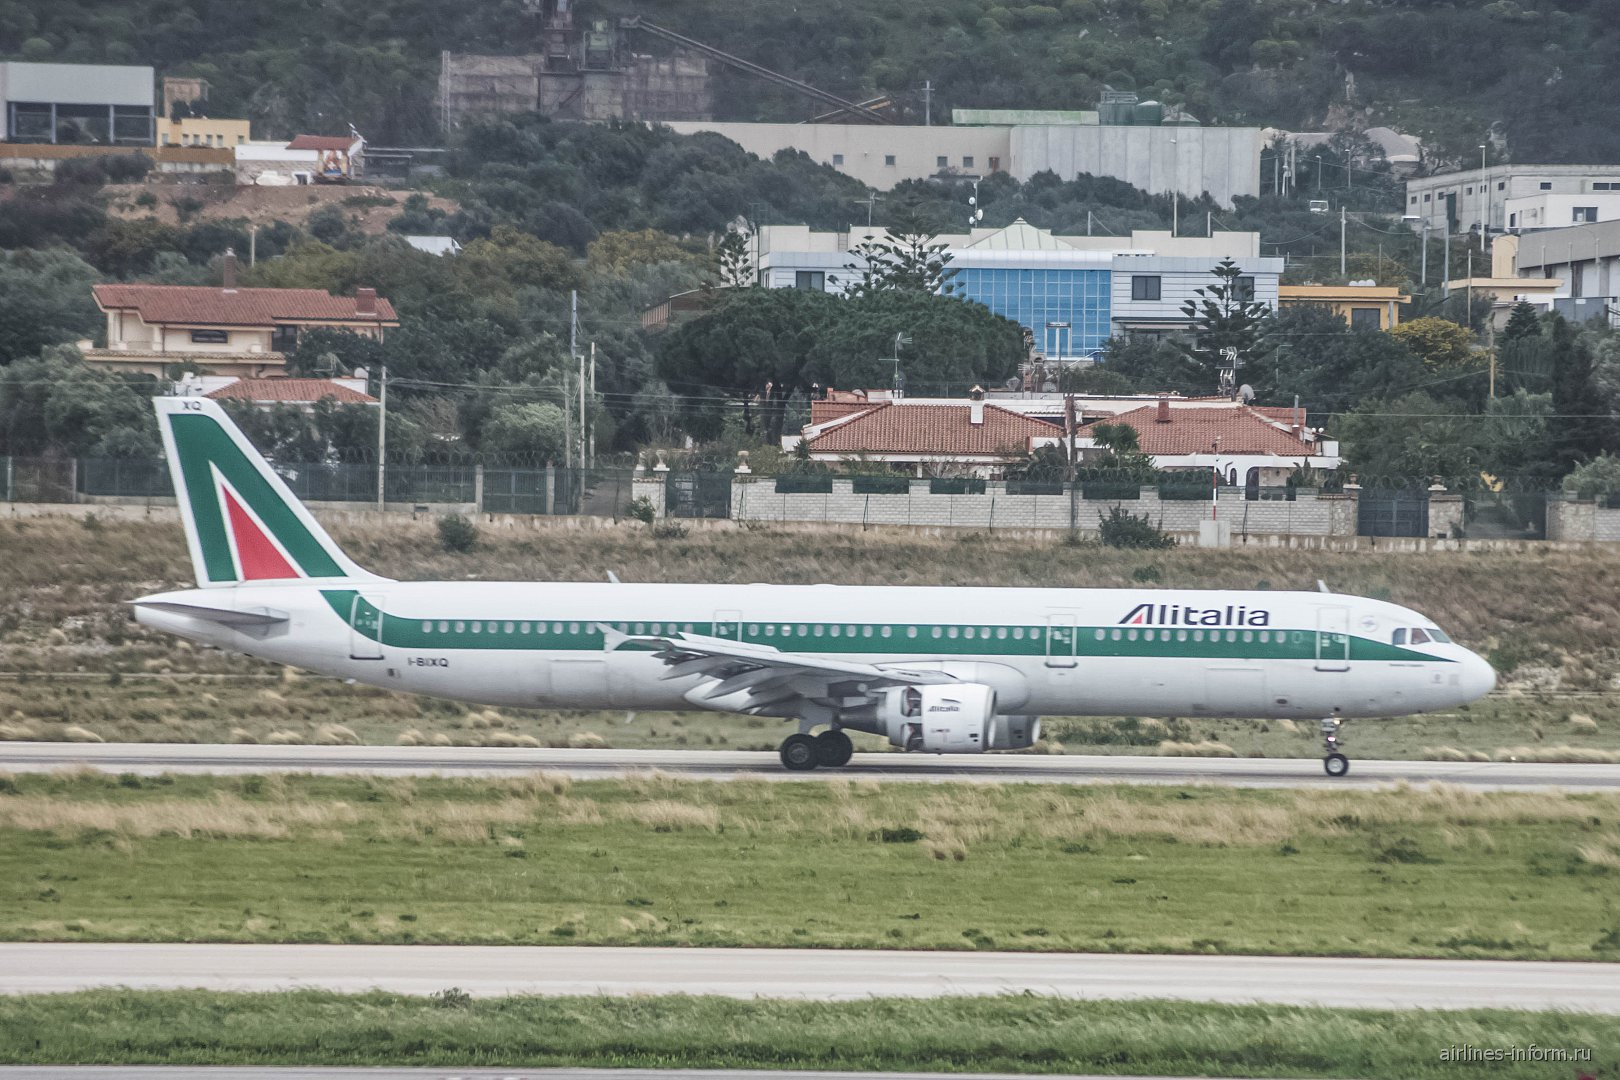 Airbus A321 I-BIXQ ������������ Alitalia � ��������� �������